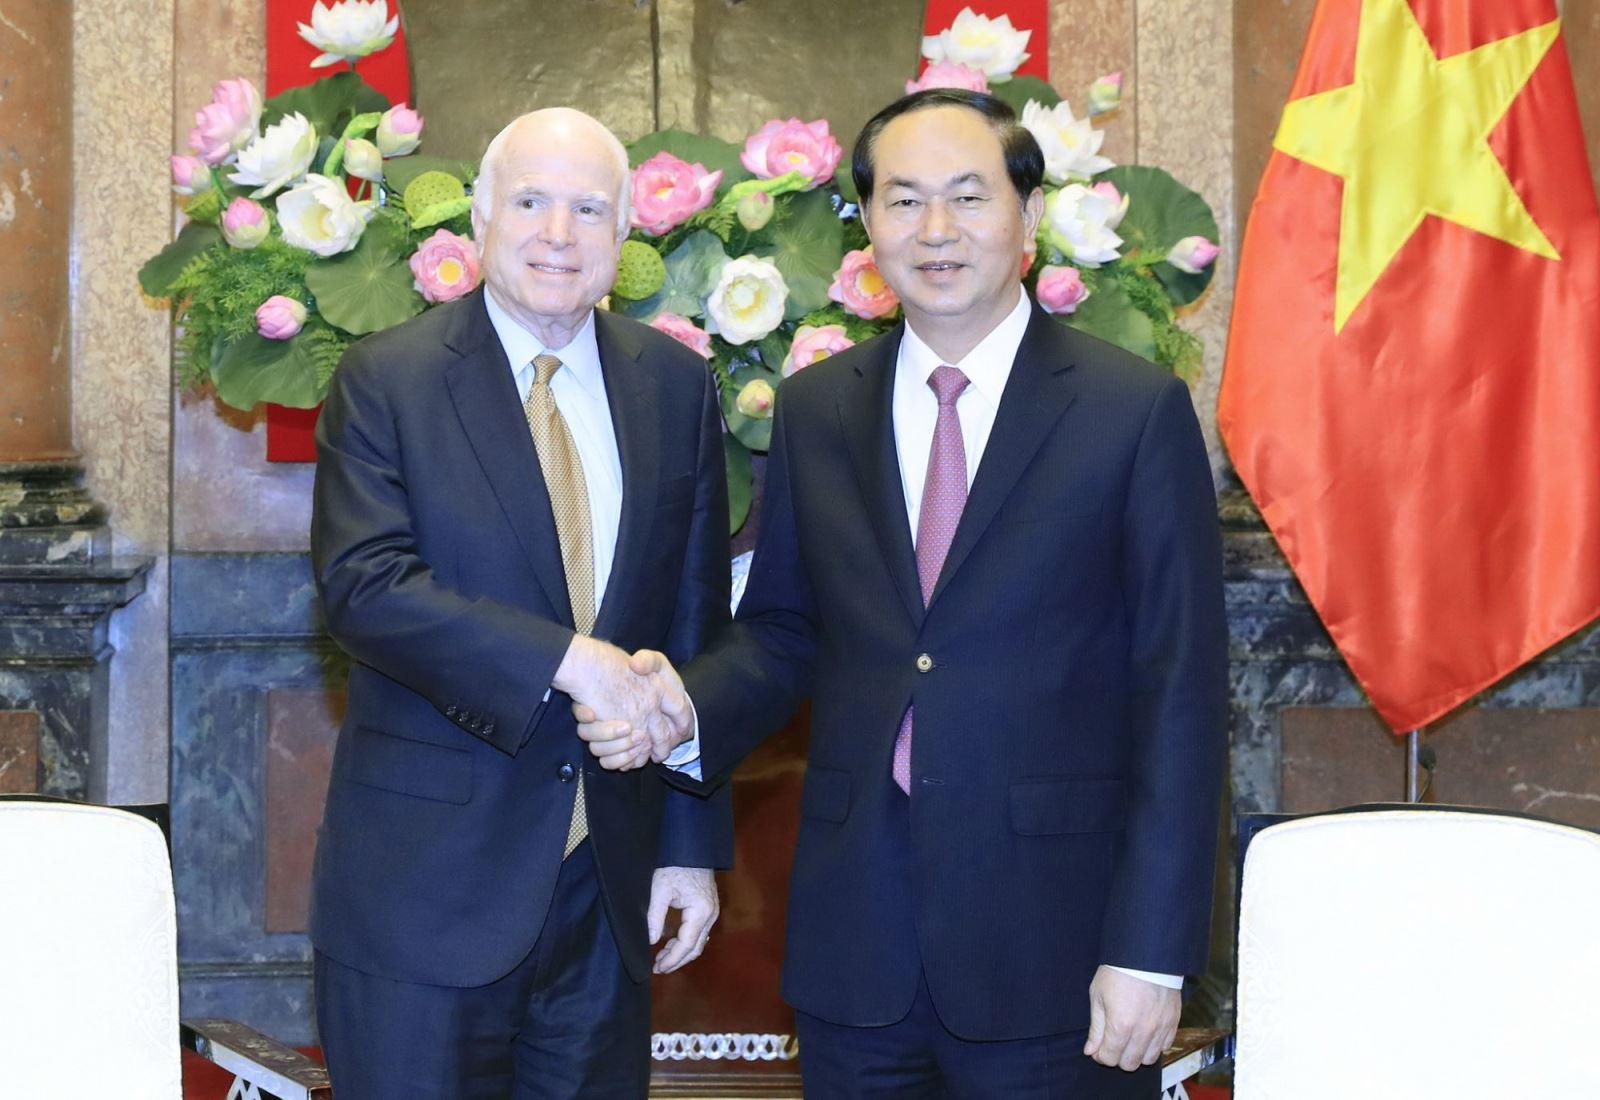 John McCain - Nguoi dong gop lon cho quan he tot dep Viet - My